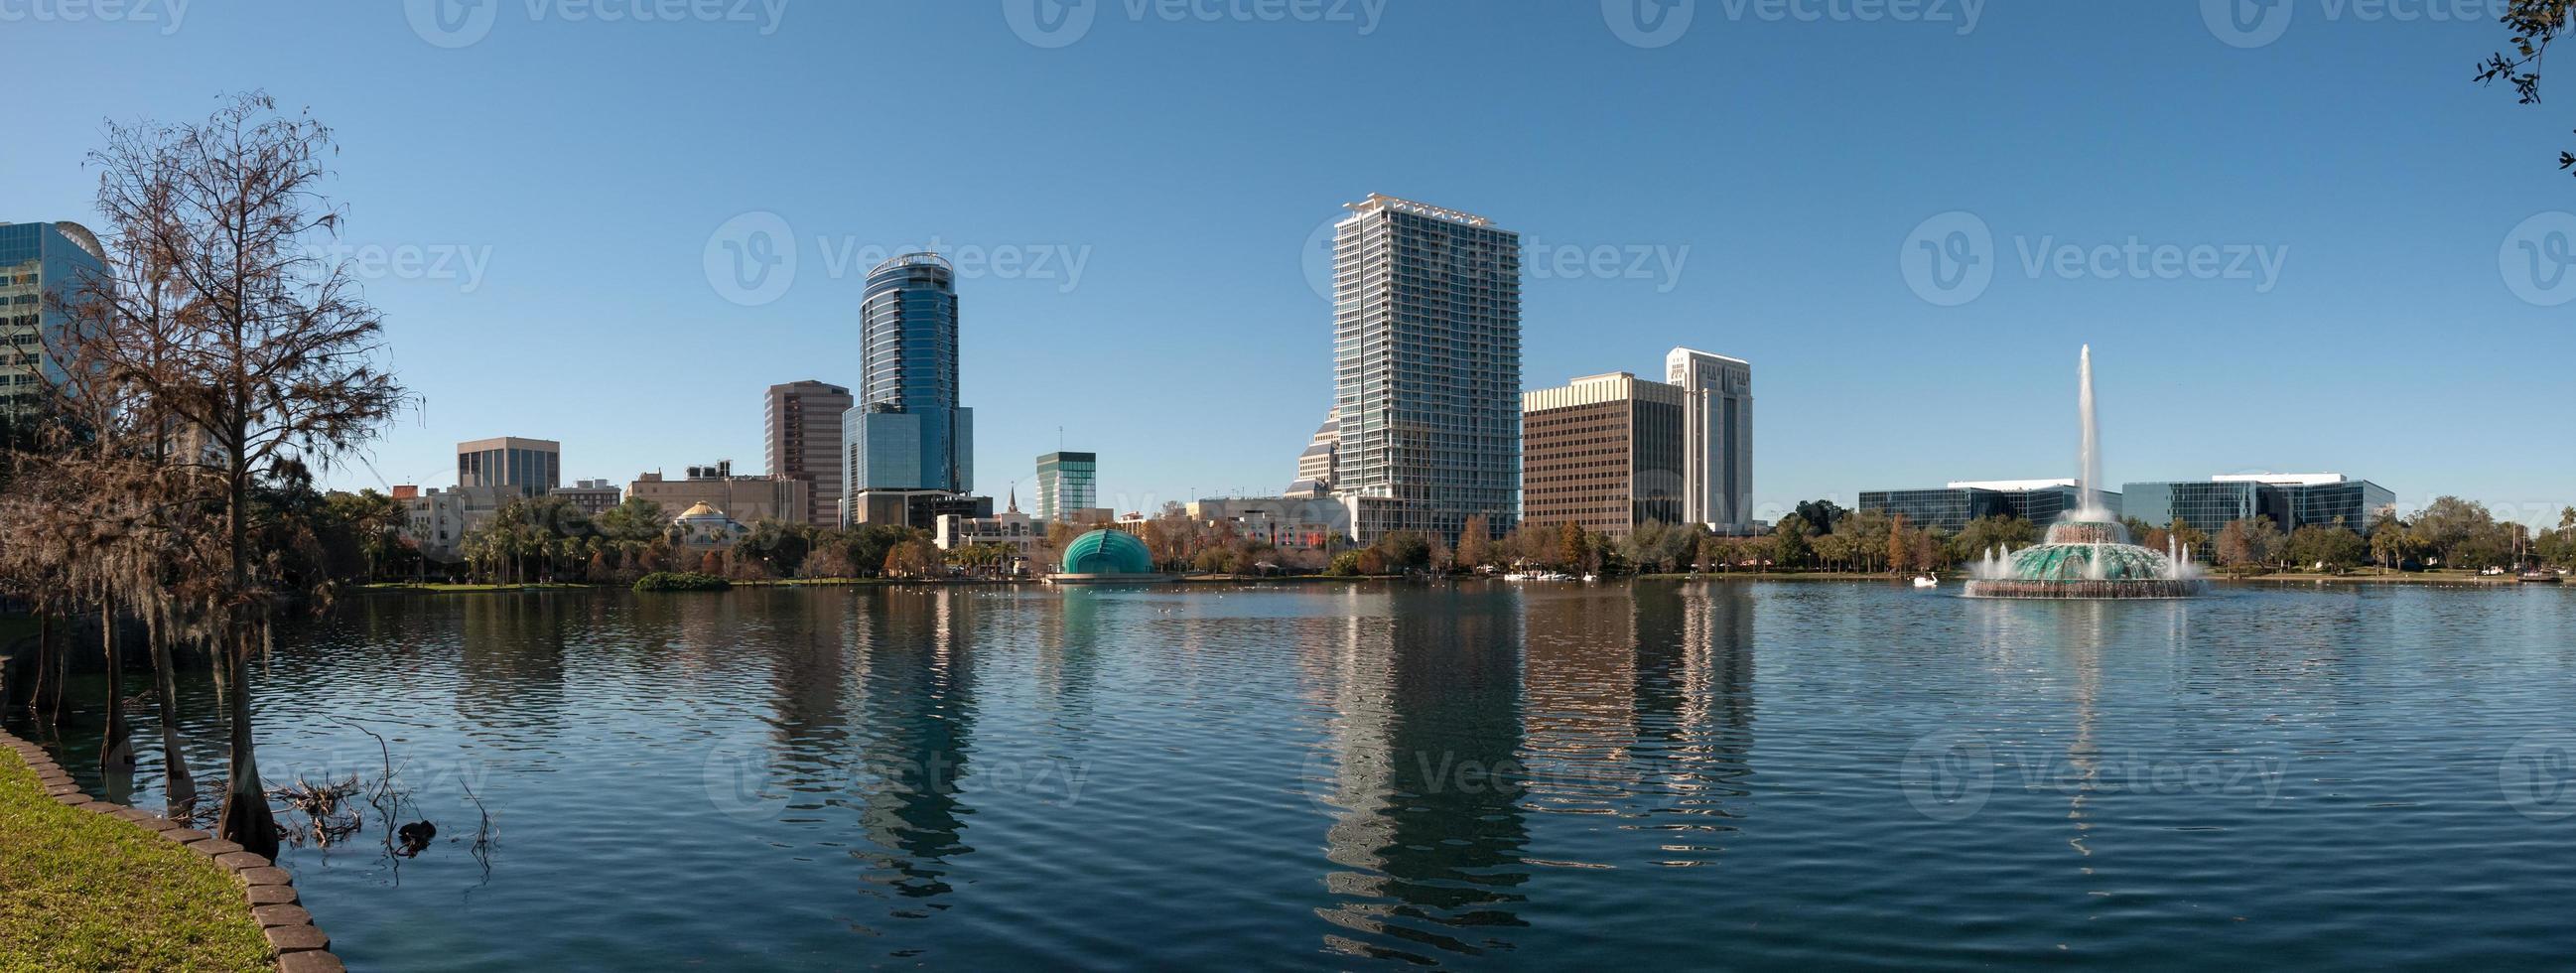 Orlando at Lake Eola photo